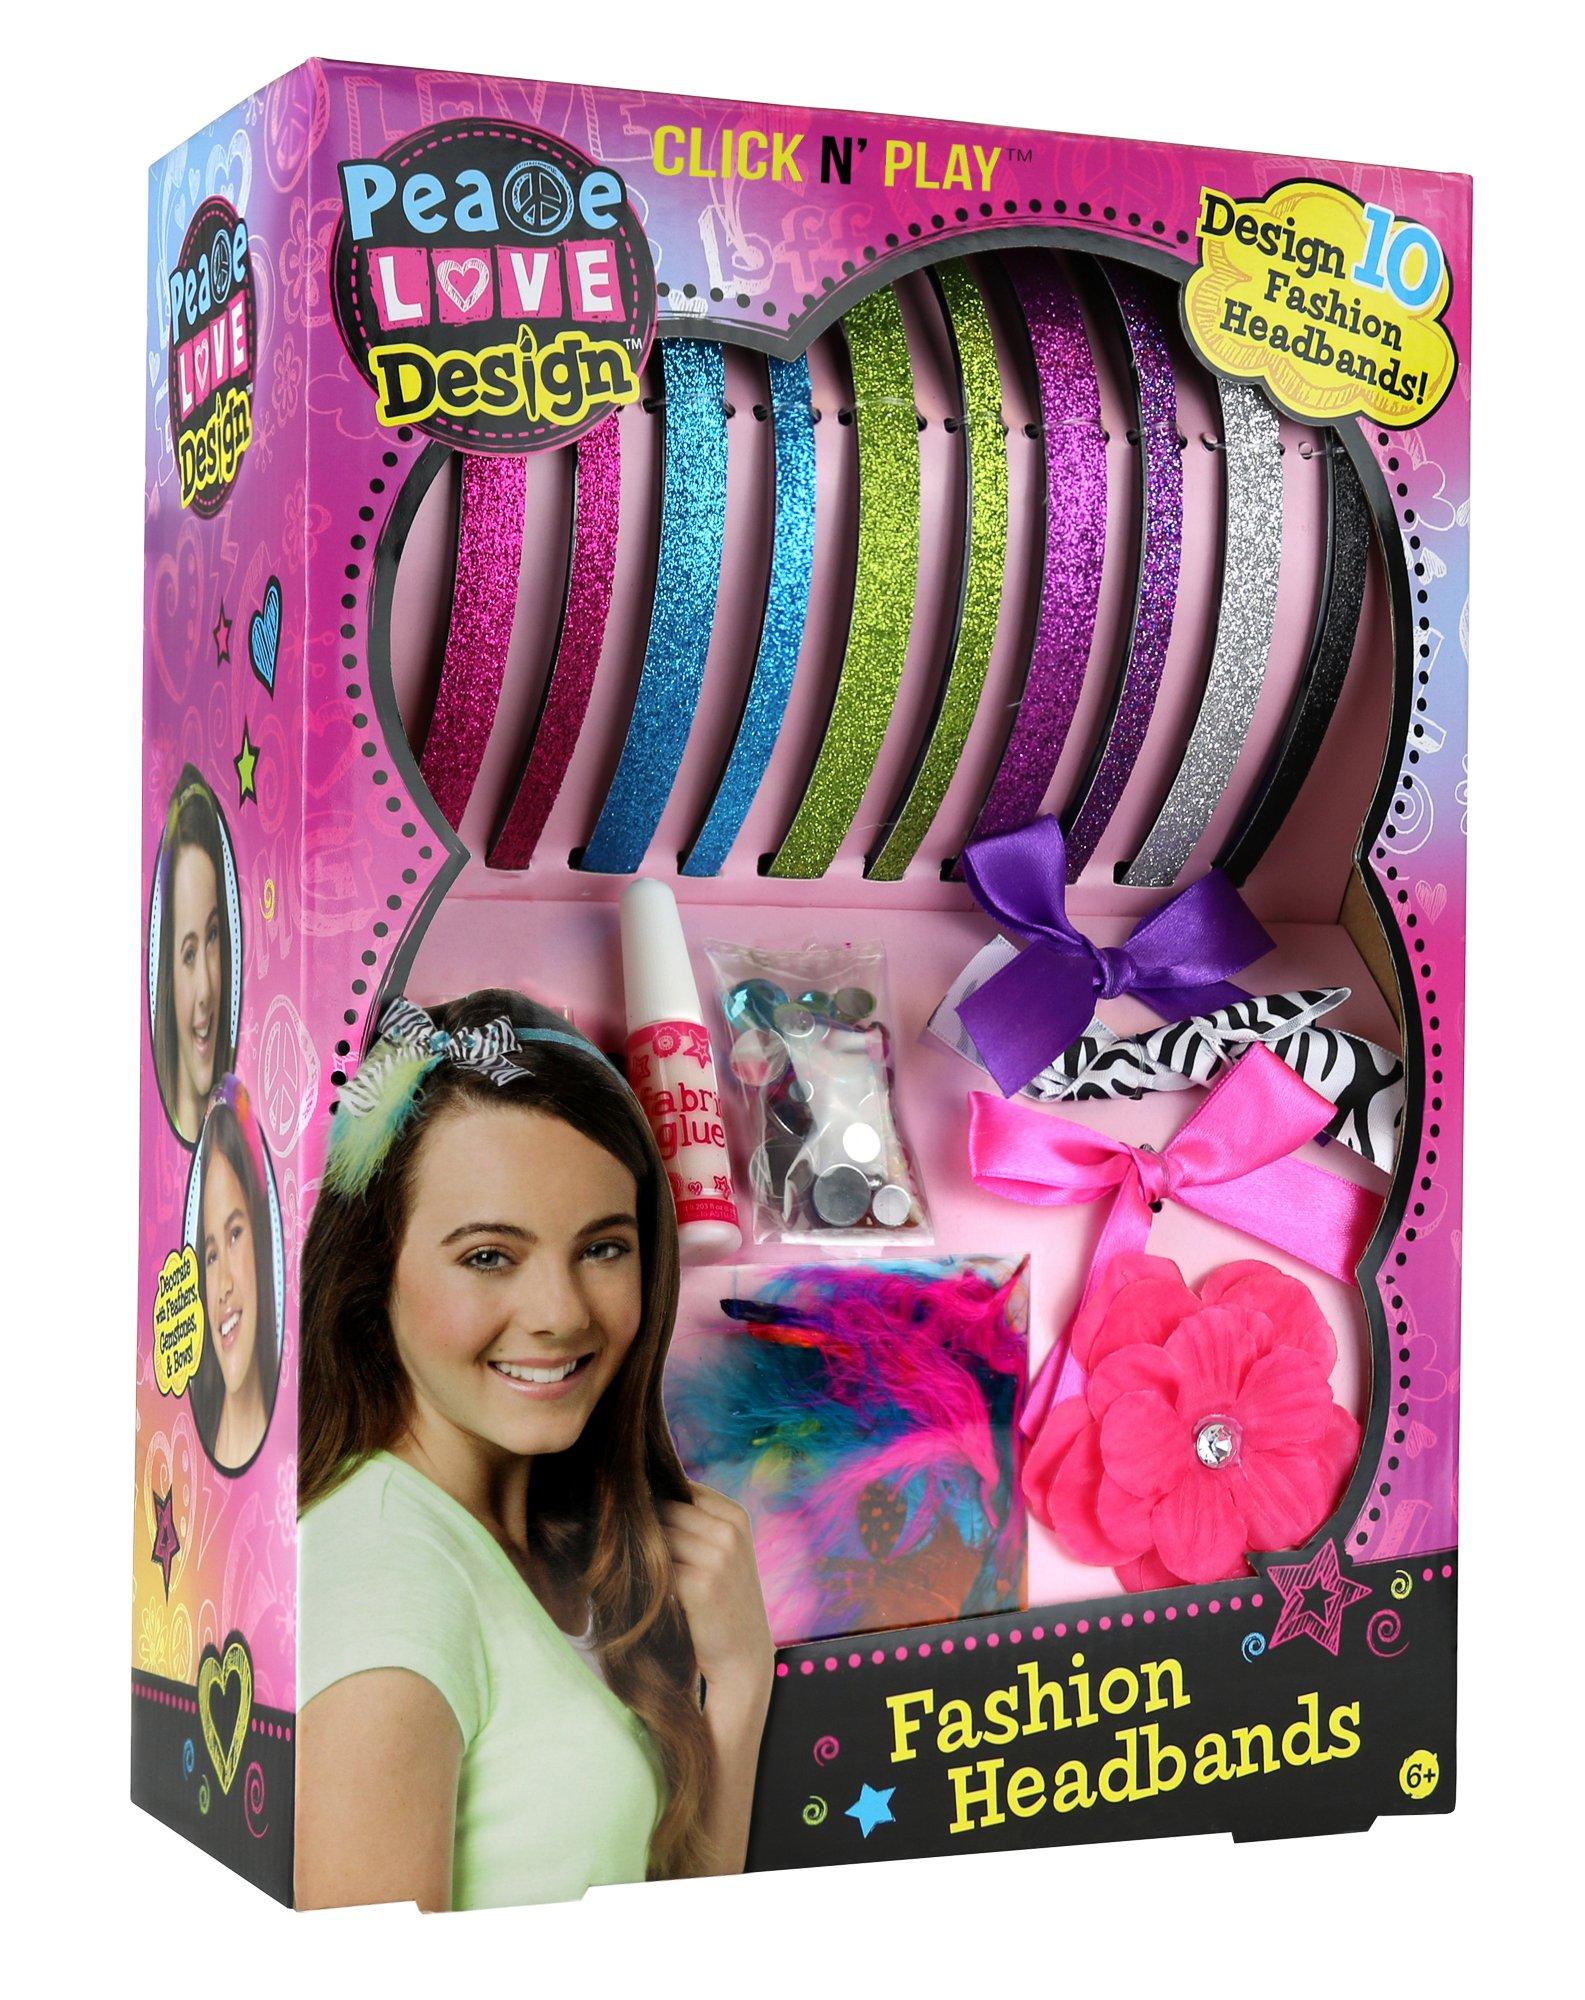 Click N' Play Fashion Headband Kit